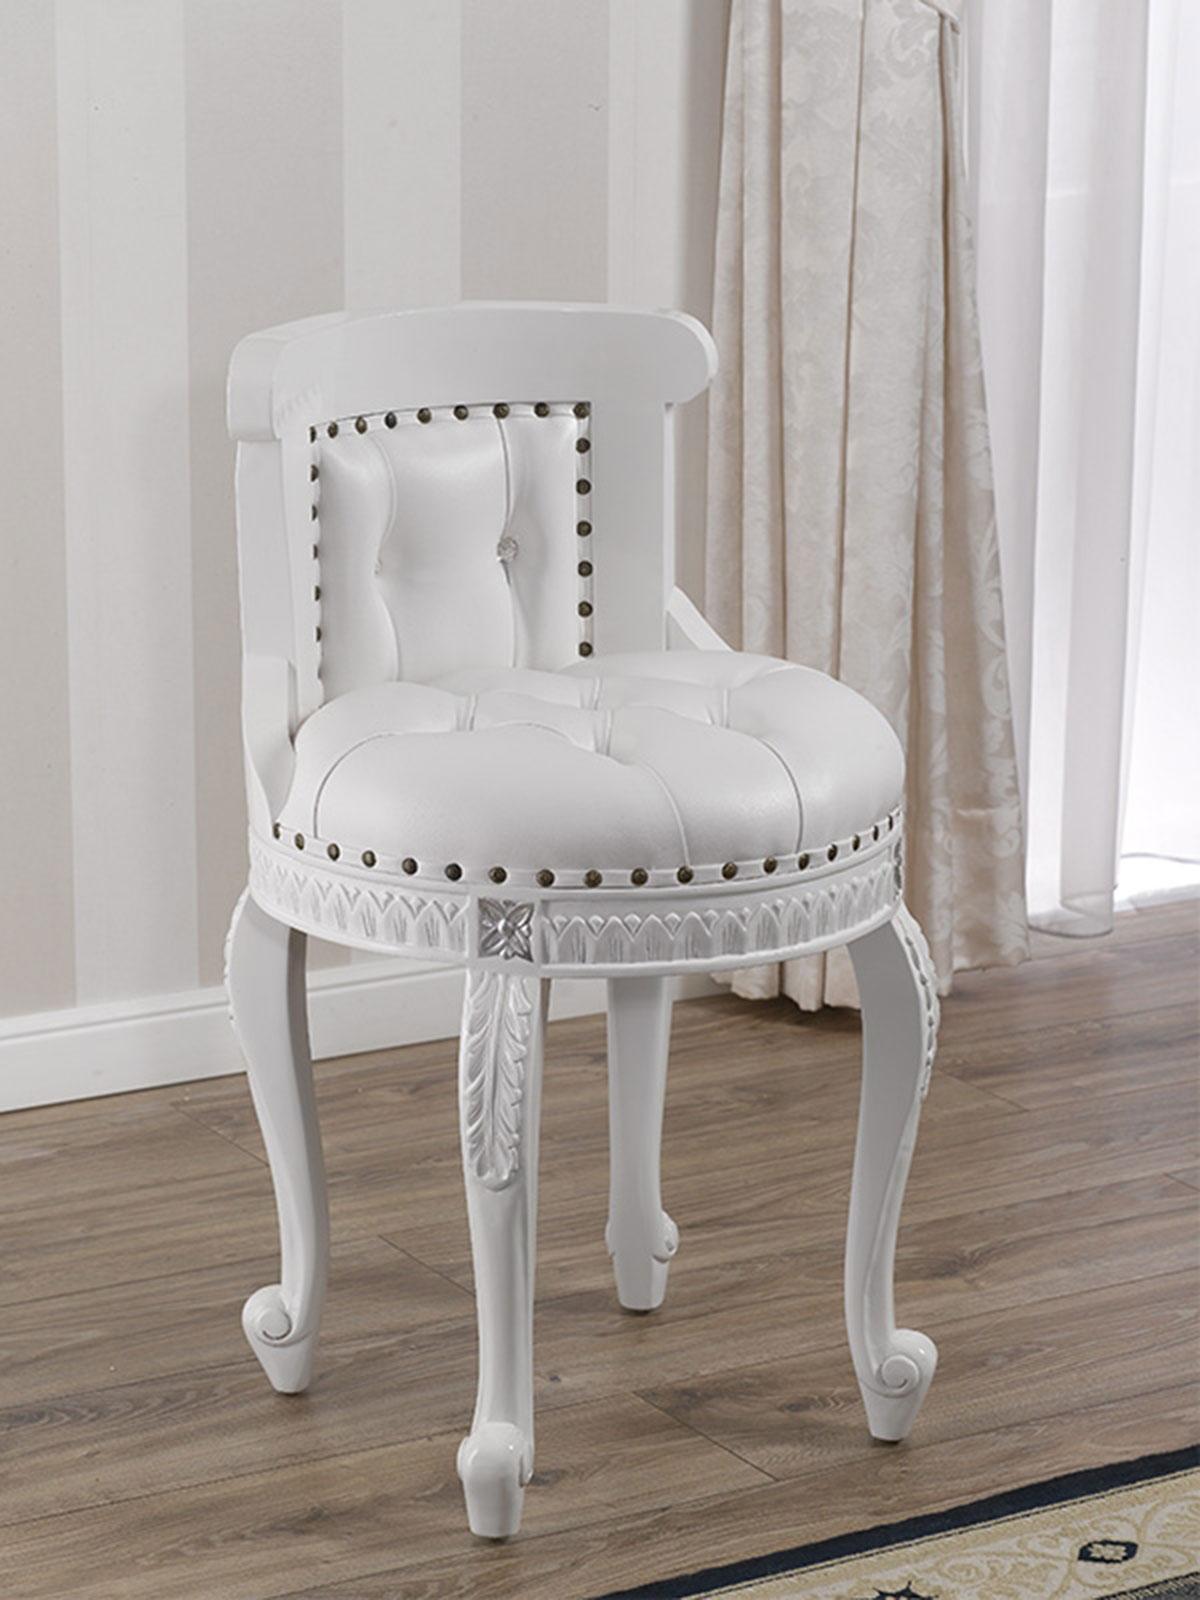 Poltroncina adeline stile barocco moderno pouf bianco for Arredamento stile barocco moderno